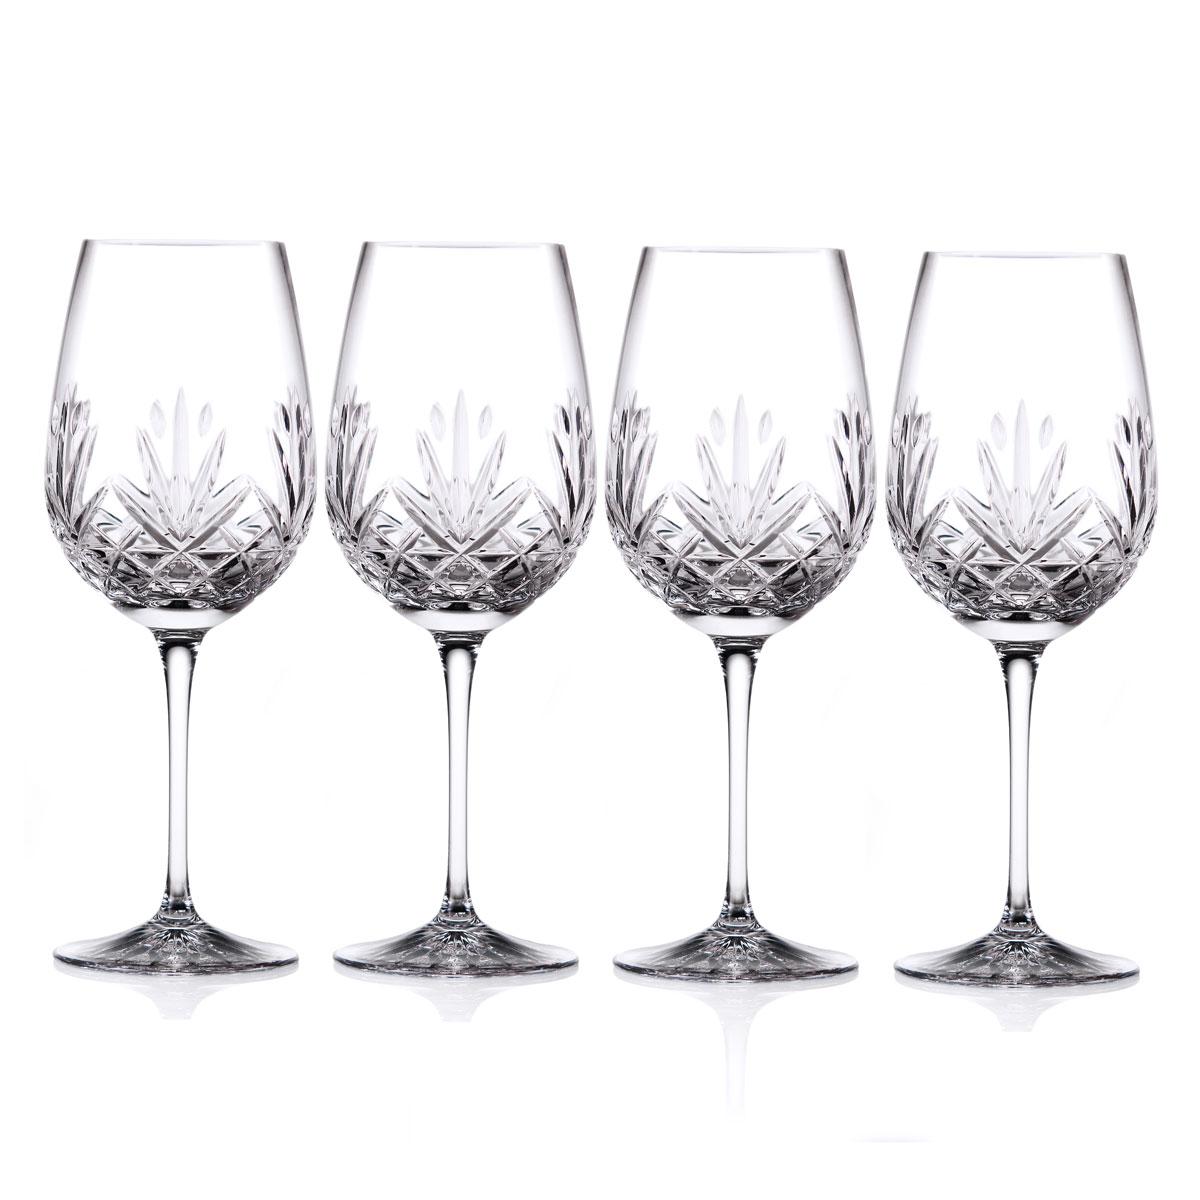 Cashs Ireland, Annestown Cabernet, Merlot, Bordeaux Crystal Wine Glasses, Set of Four